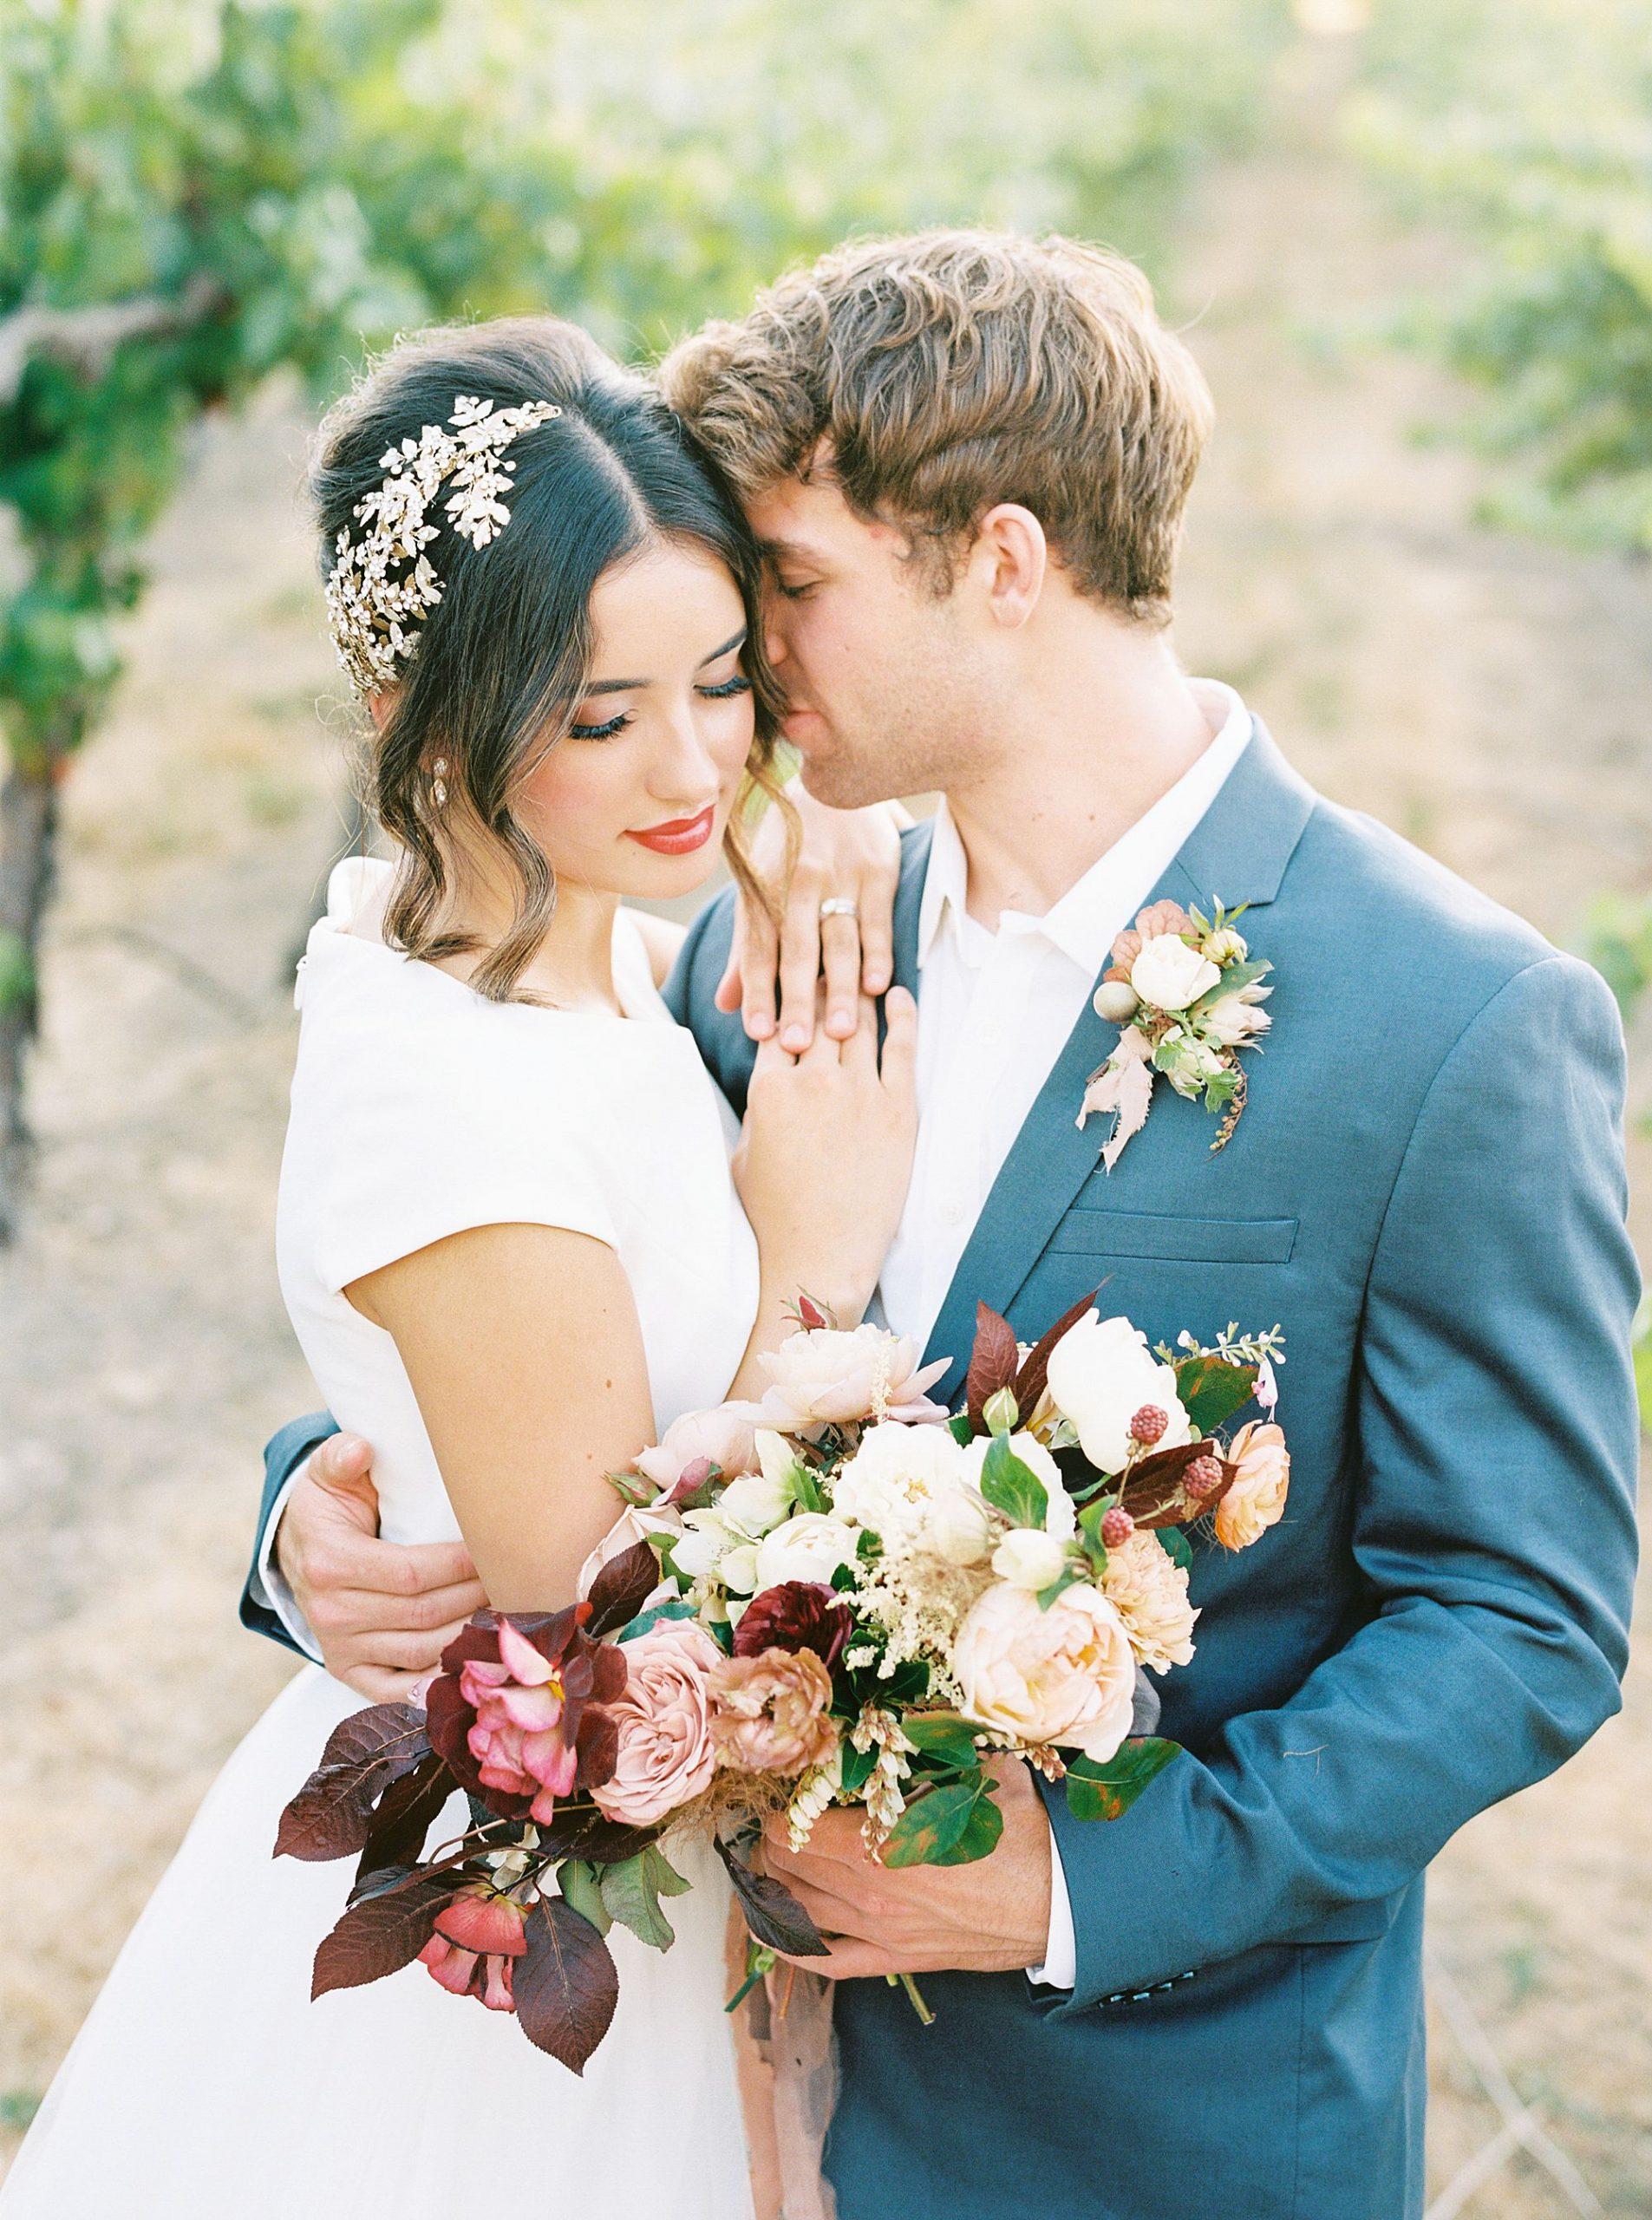 HammerSky Wedding Inspiration Featured on Hey Wedding Lady with Vanessa Noel Events - Ashley Baumgartner - SLO Wedding Photographer_0004.jpg